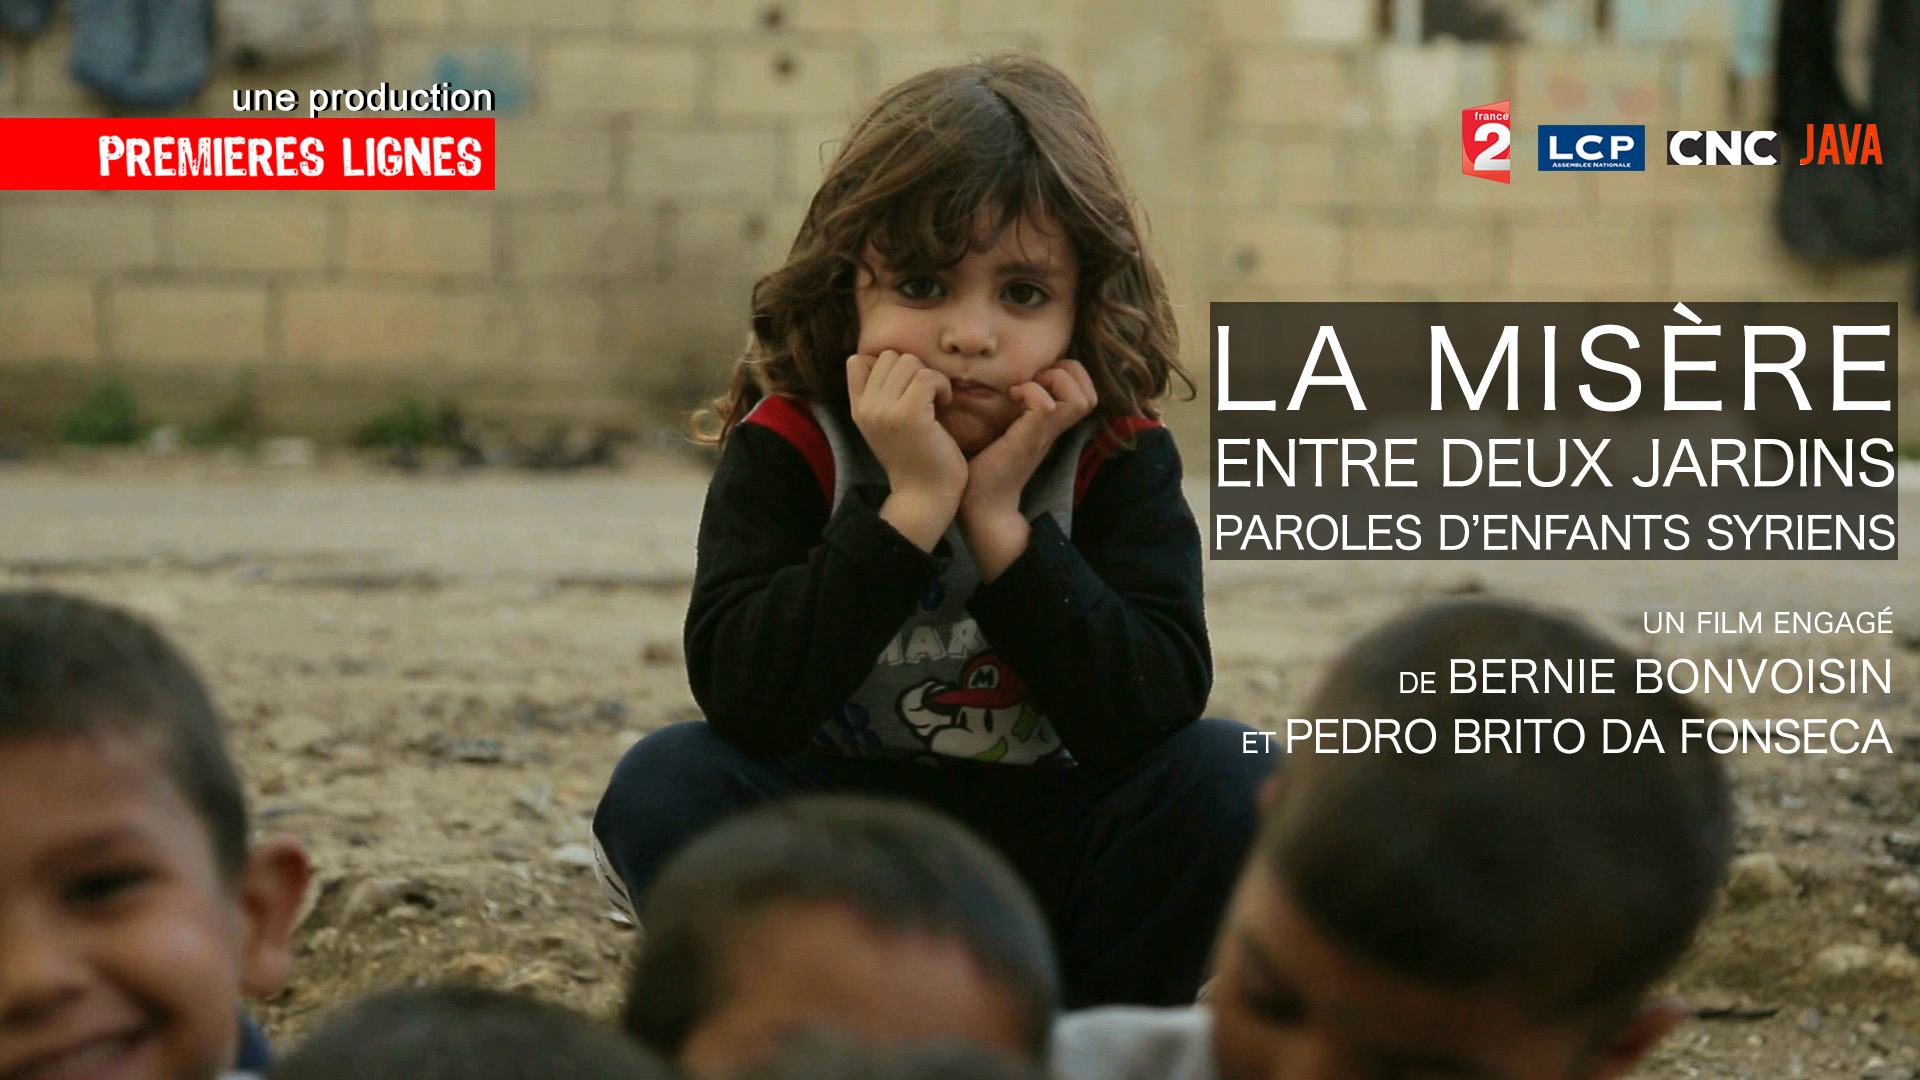 enfants syriens aff1